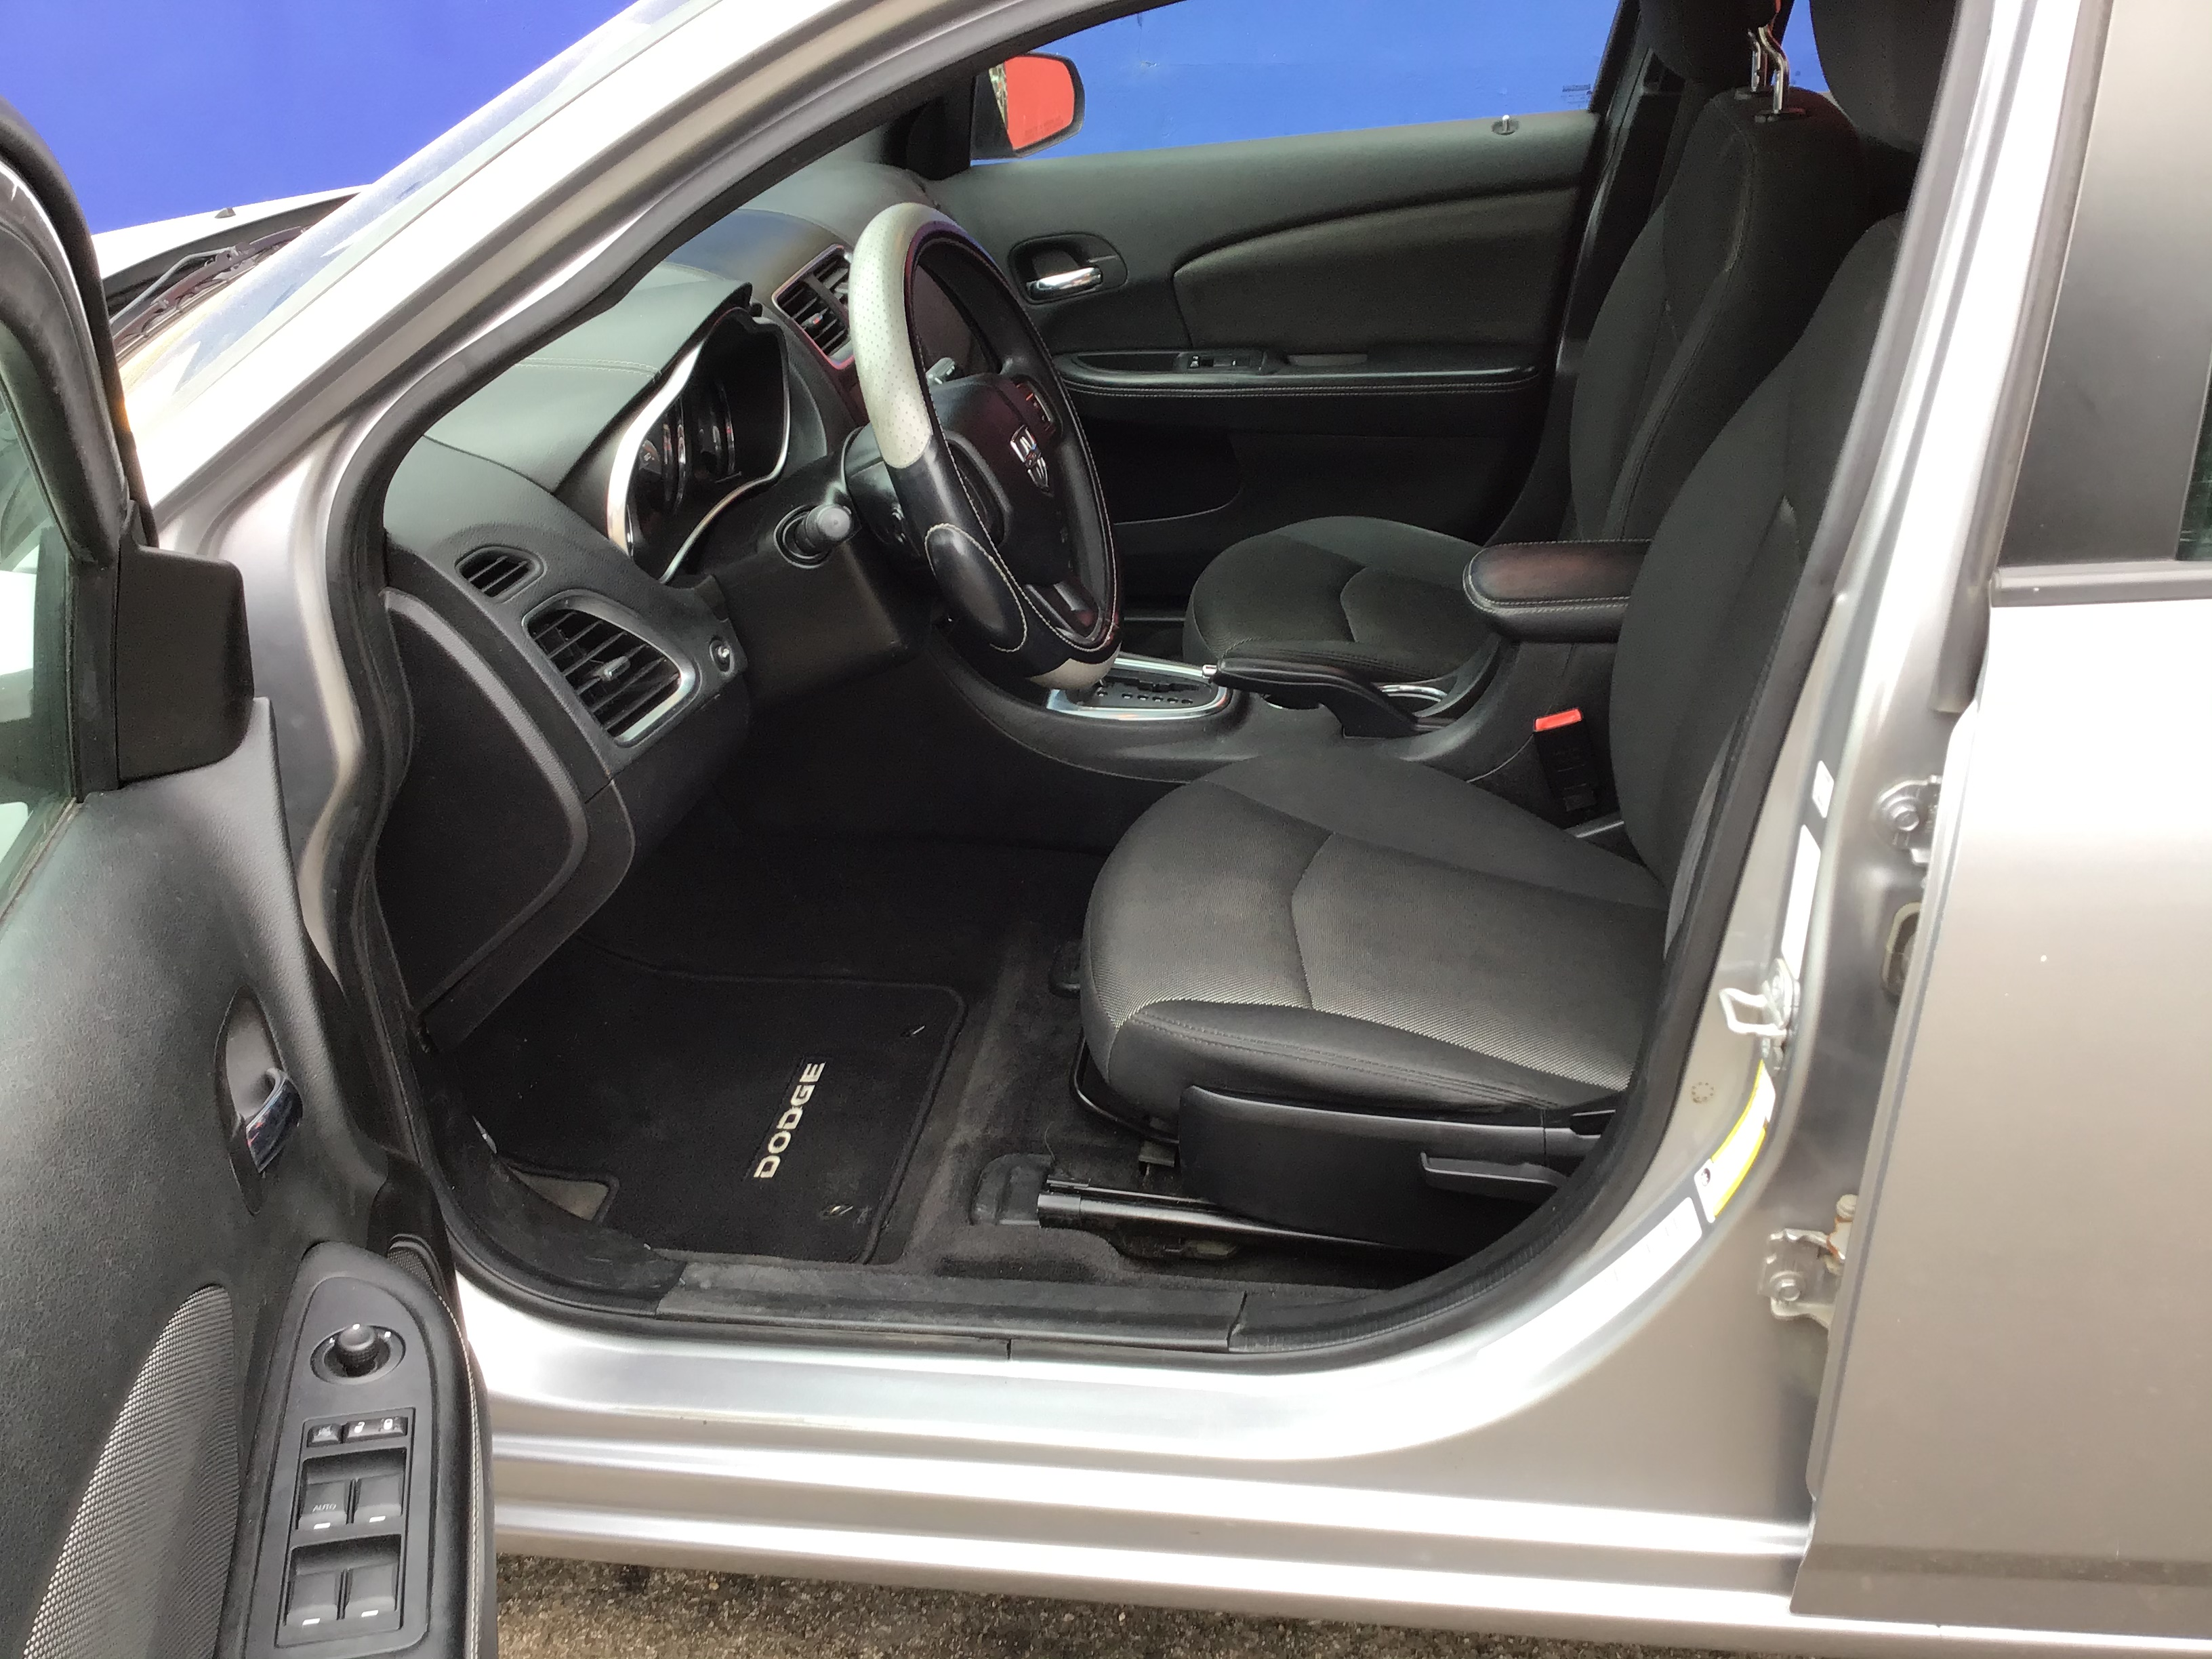 used vehicle - Sedan DODGE AVENGER 2014